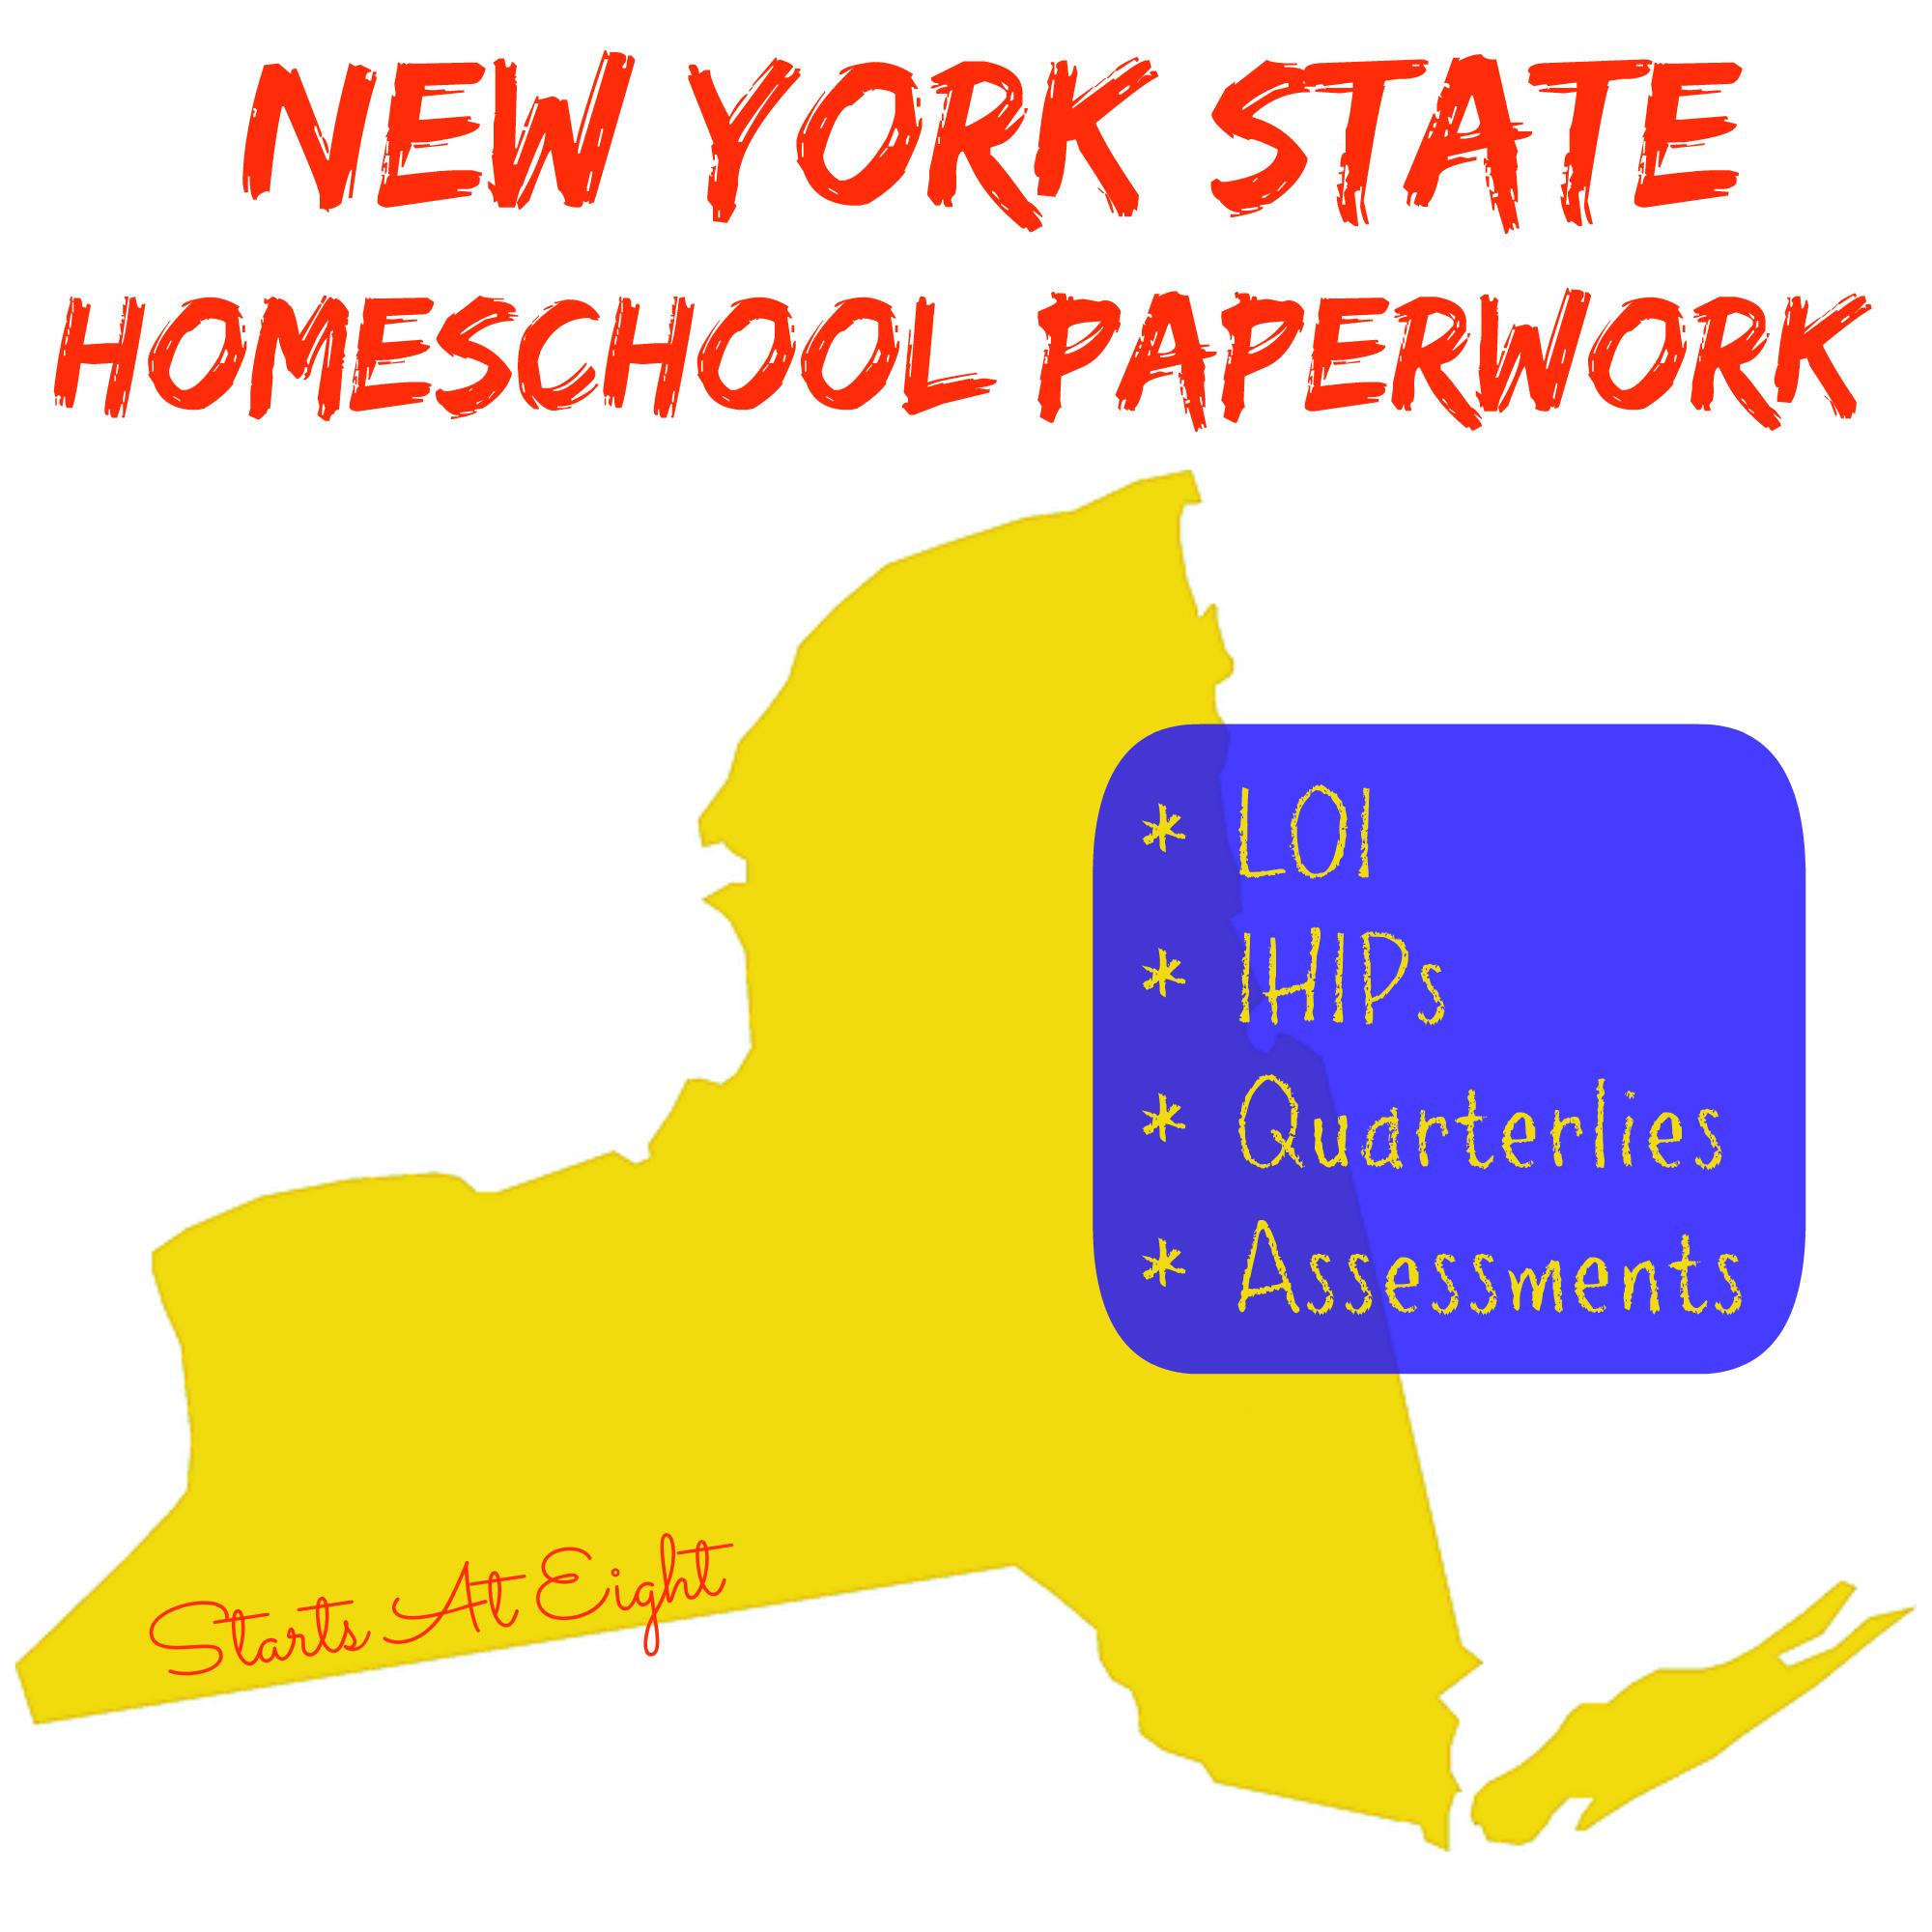 hight resolution of New York State Homeschool Paperwork - StartsAtEight